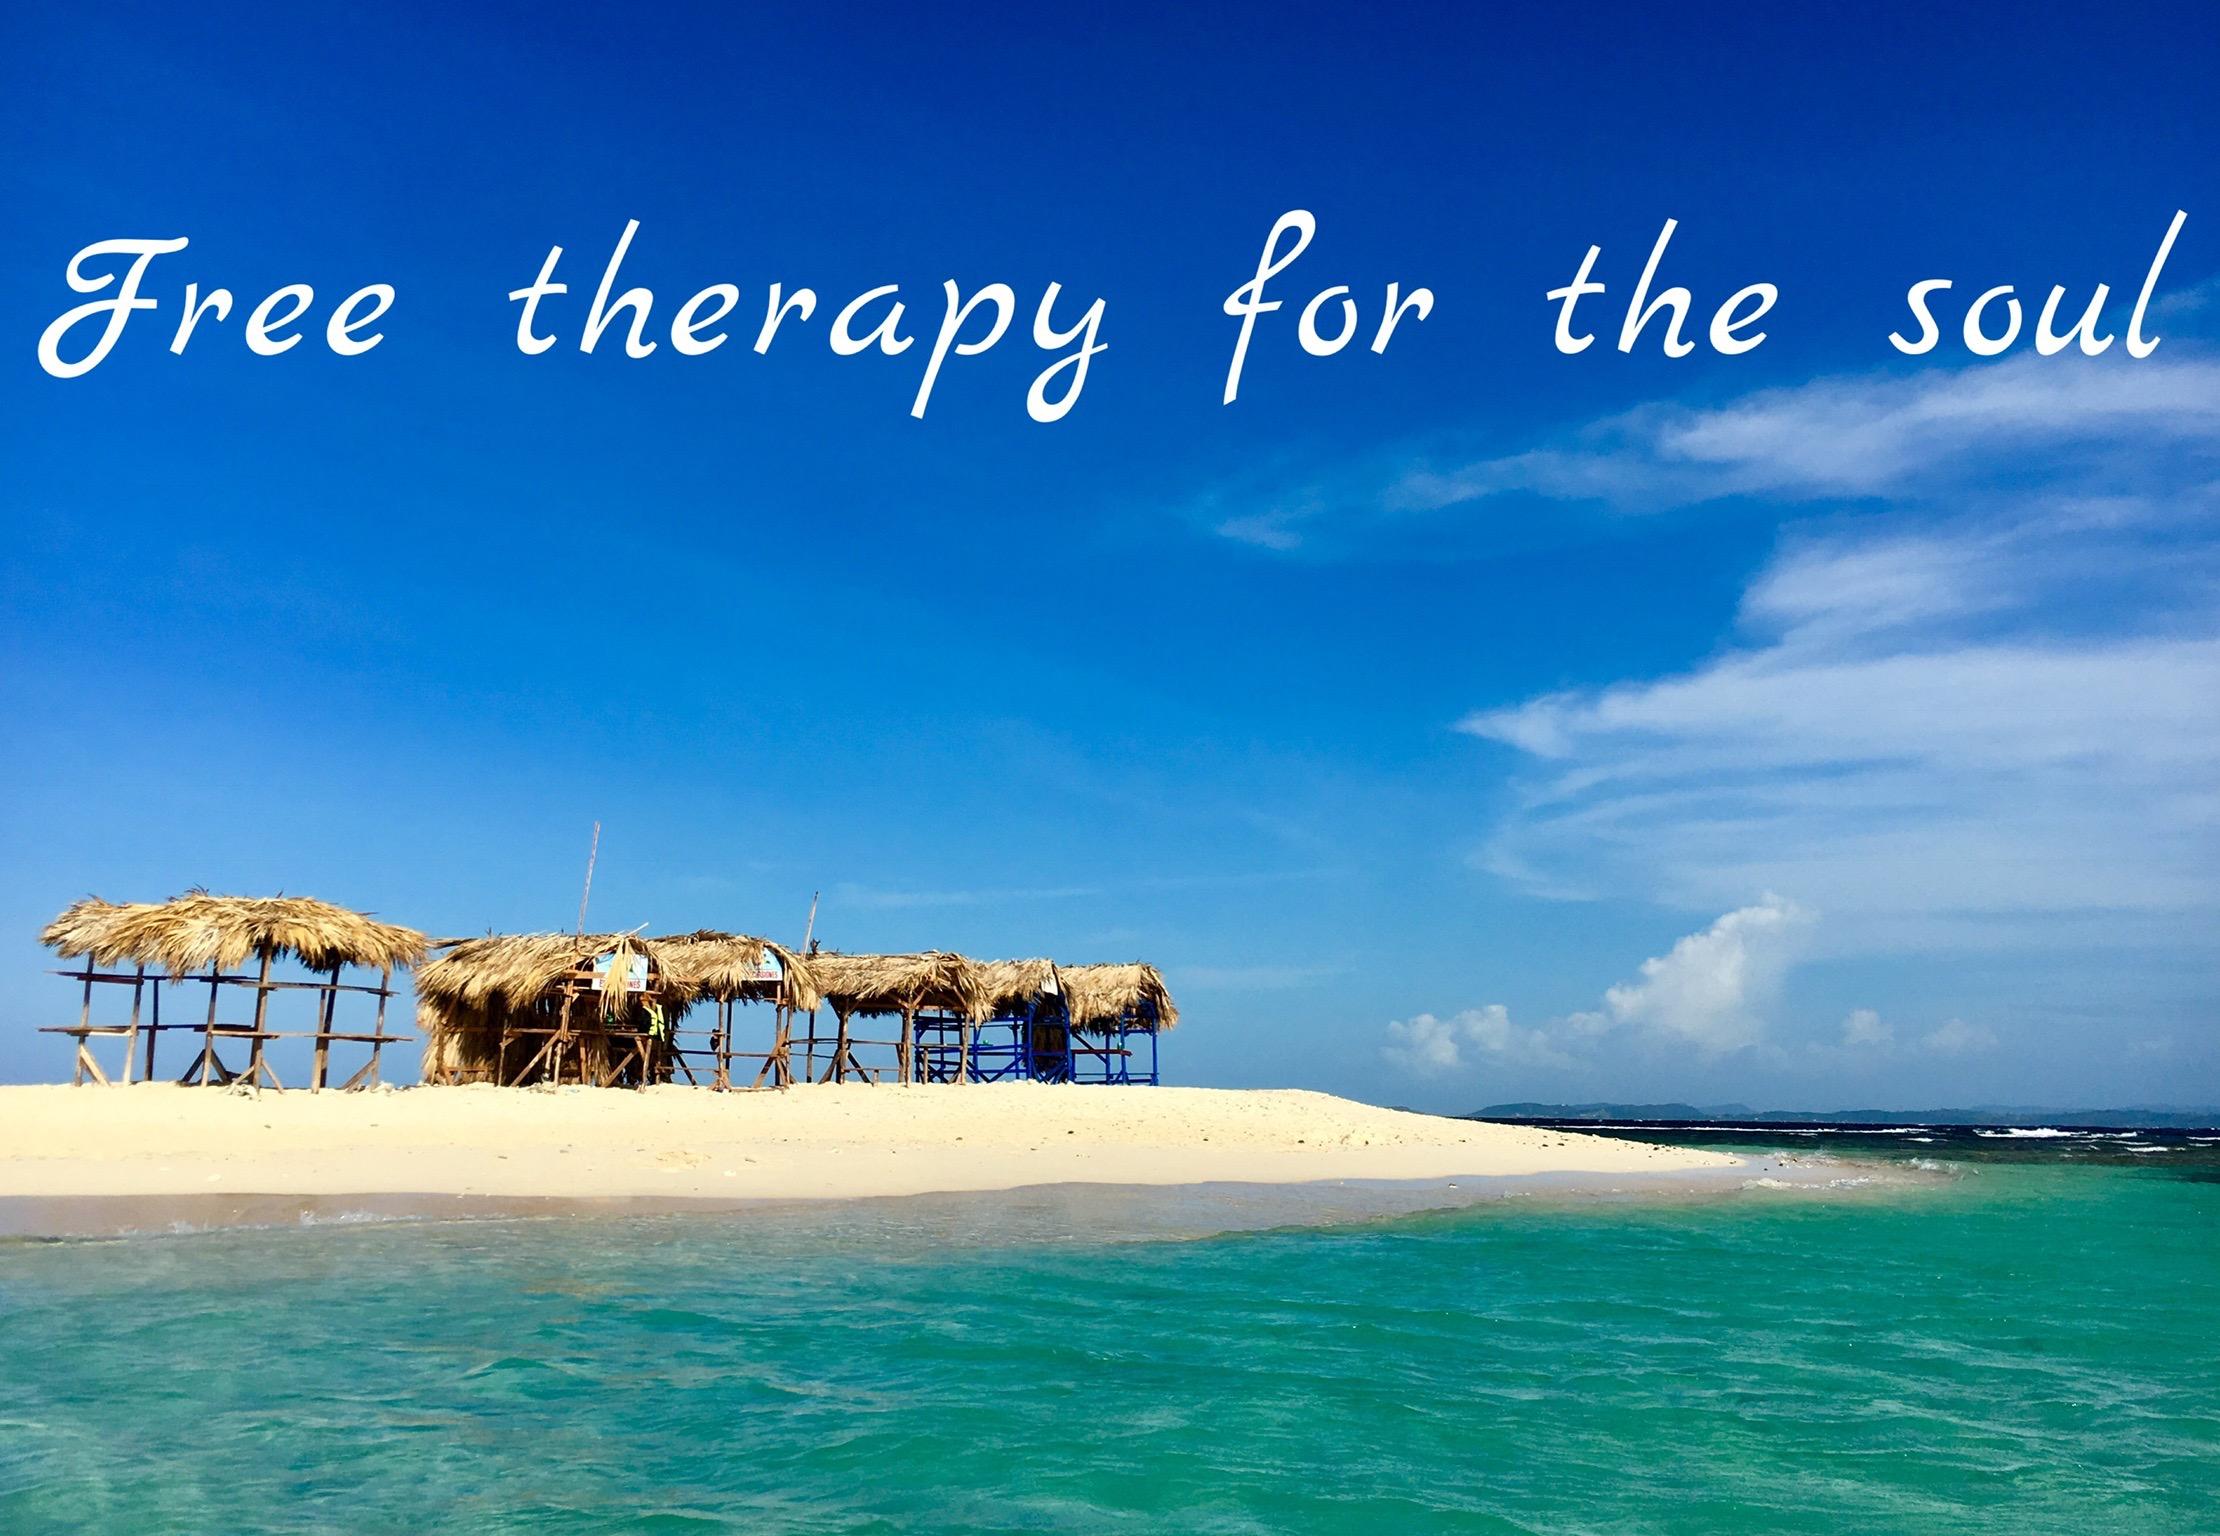 boldogterapia.jpg